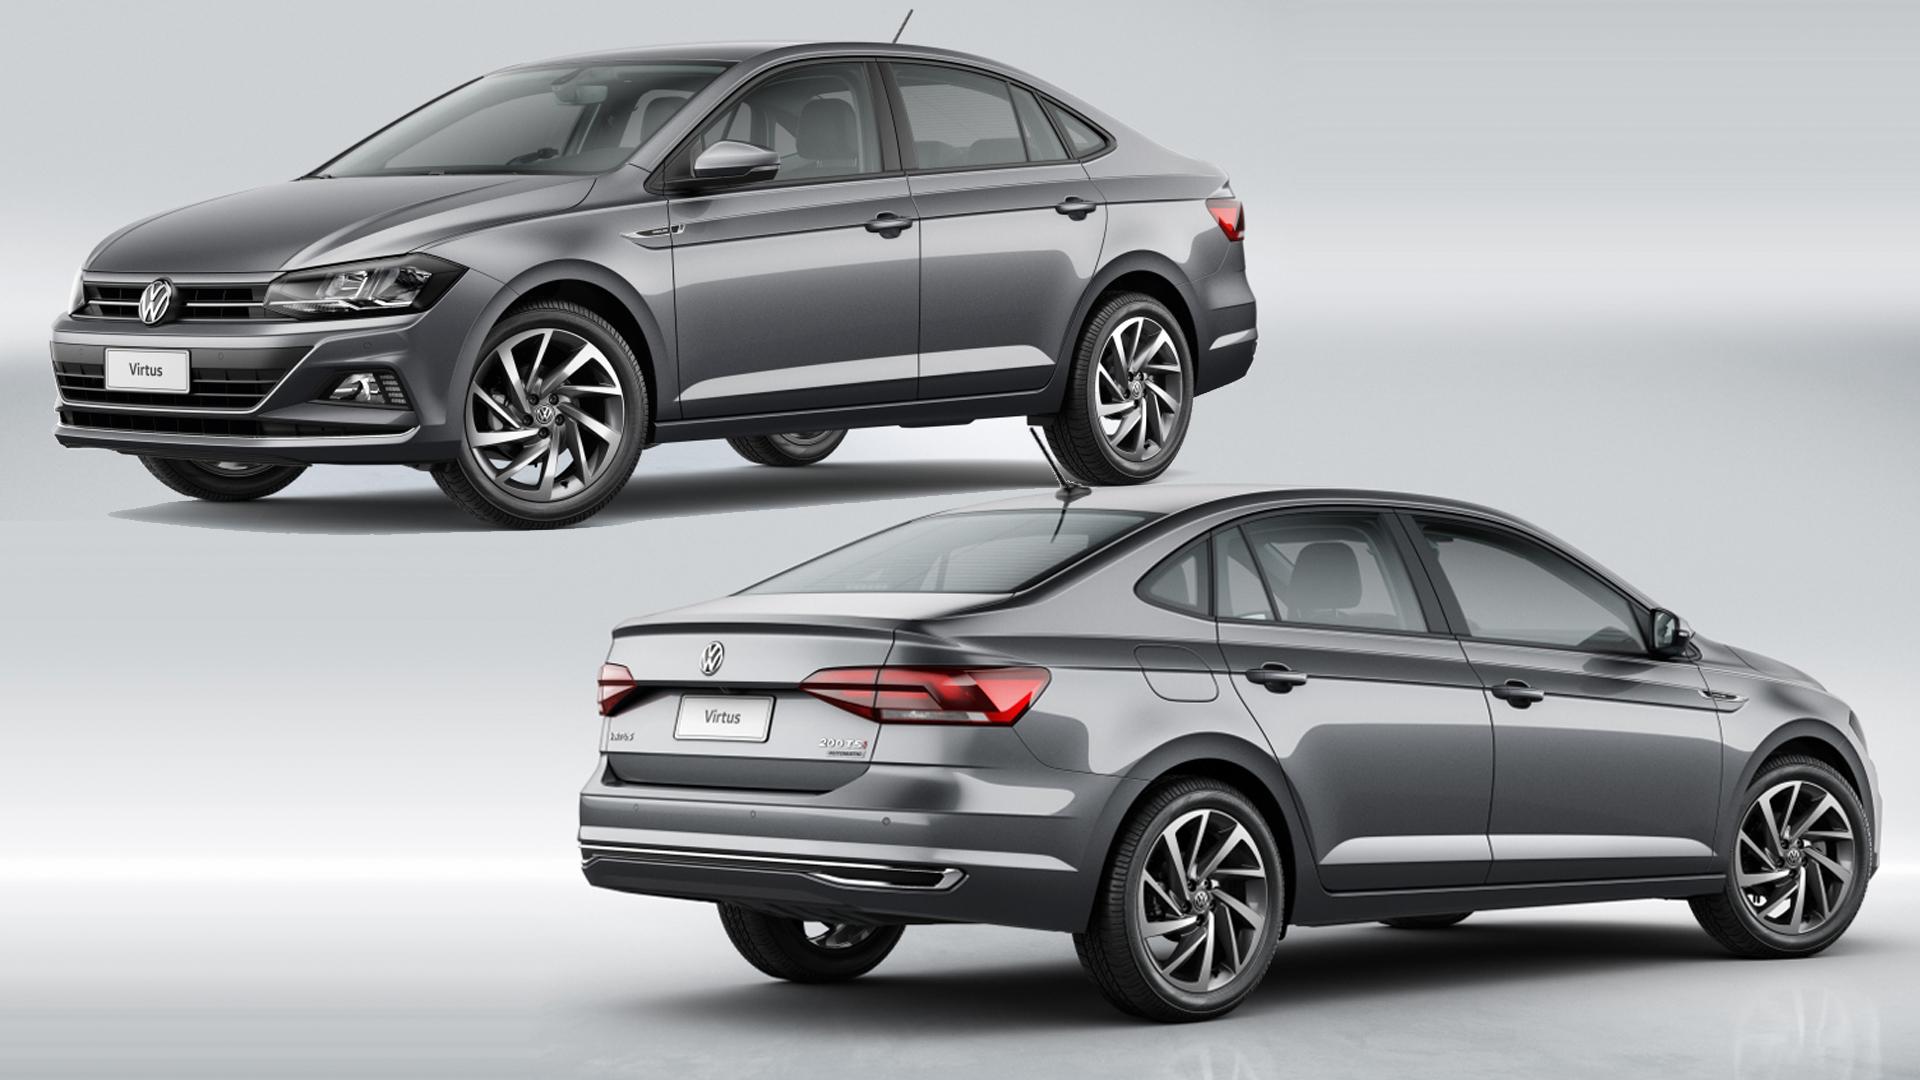 Volkswagen Virtus / Polo седан 2019